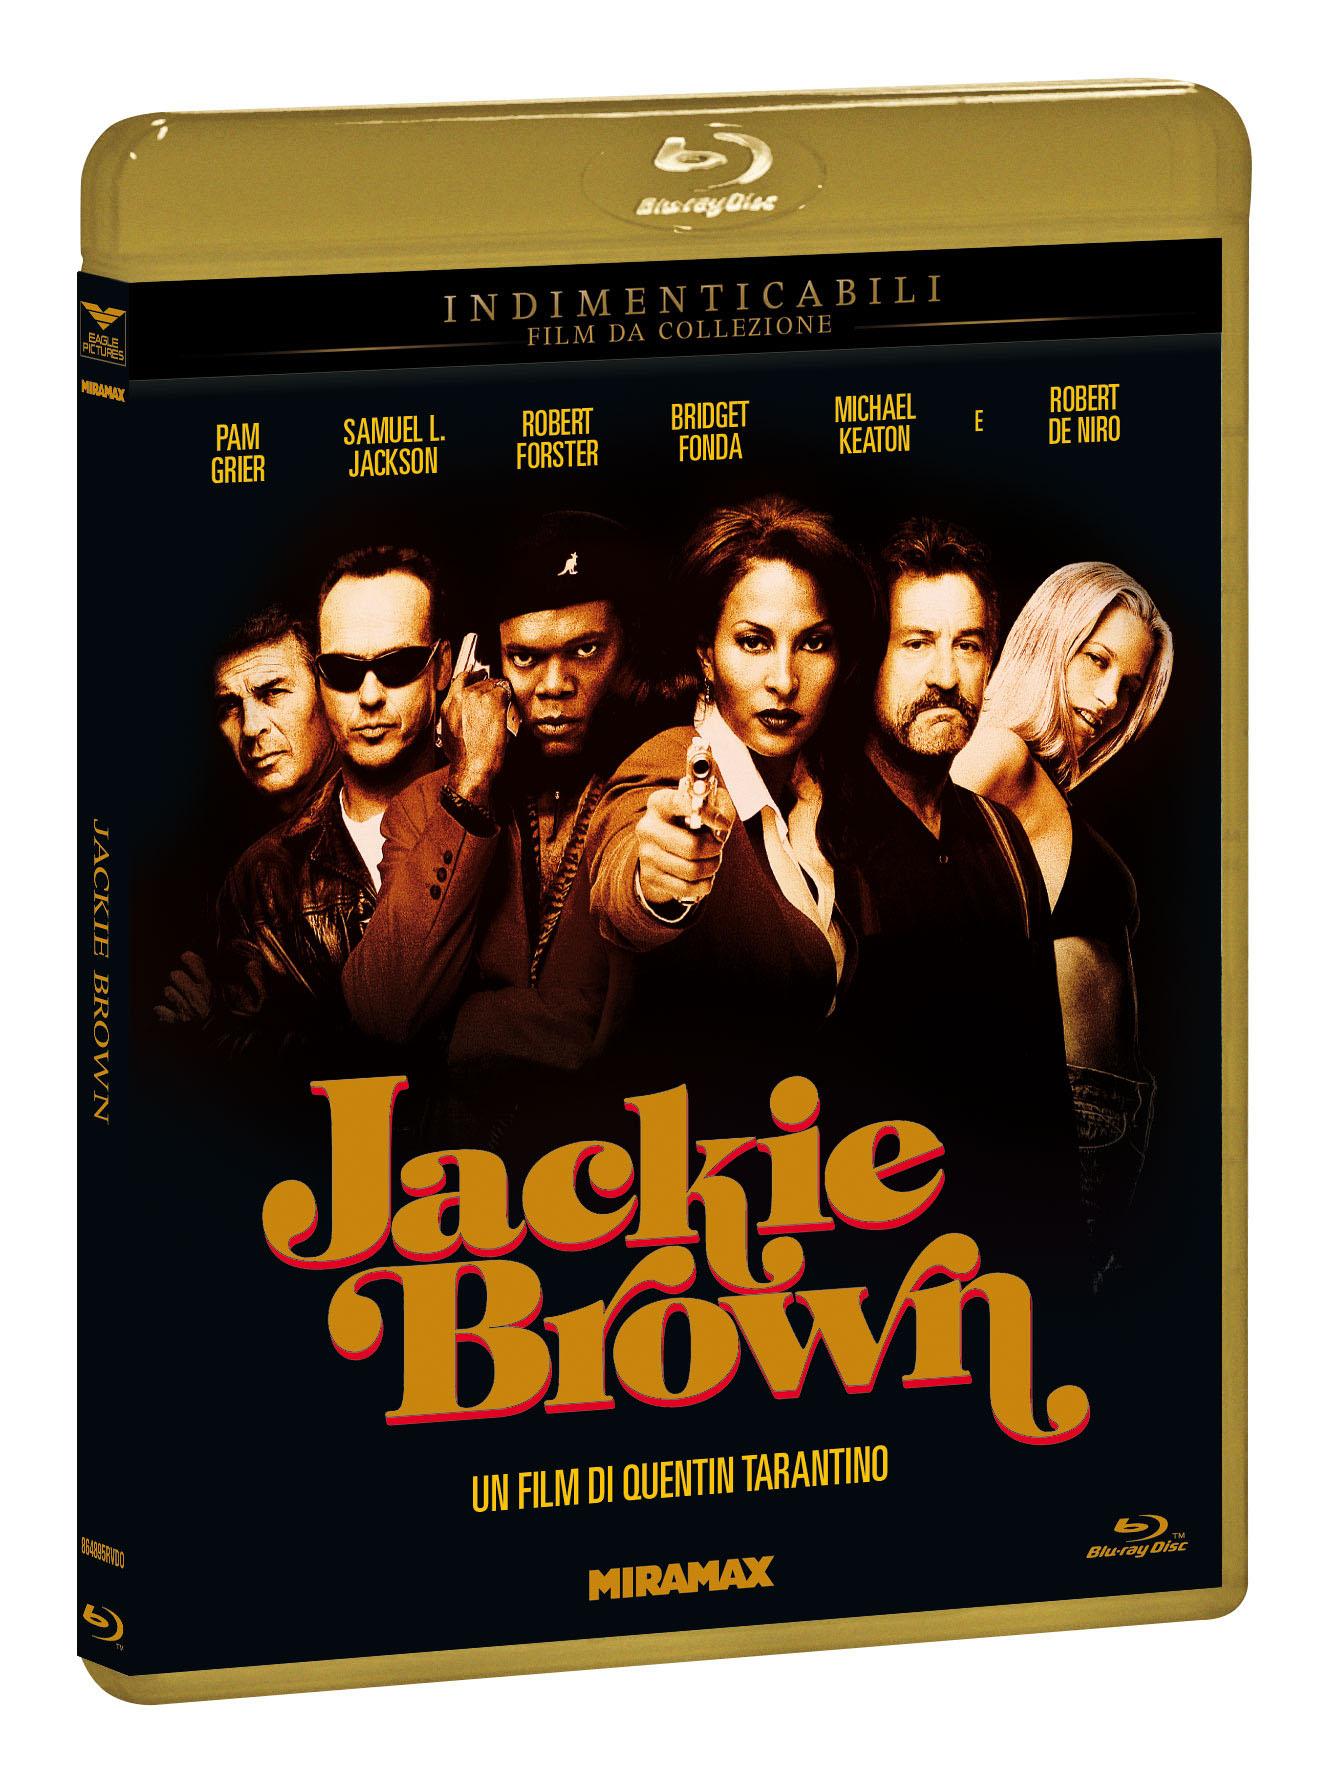 JACKIE BROWN (INDIMENTICABILI) - BLU RAY